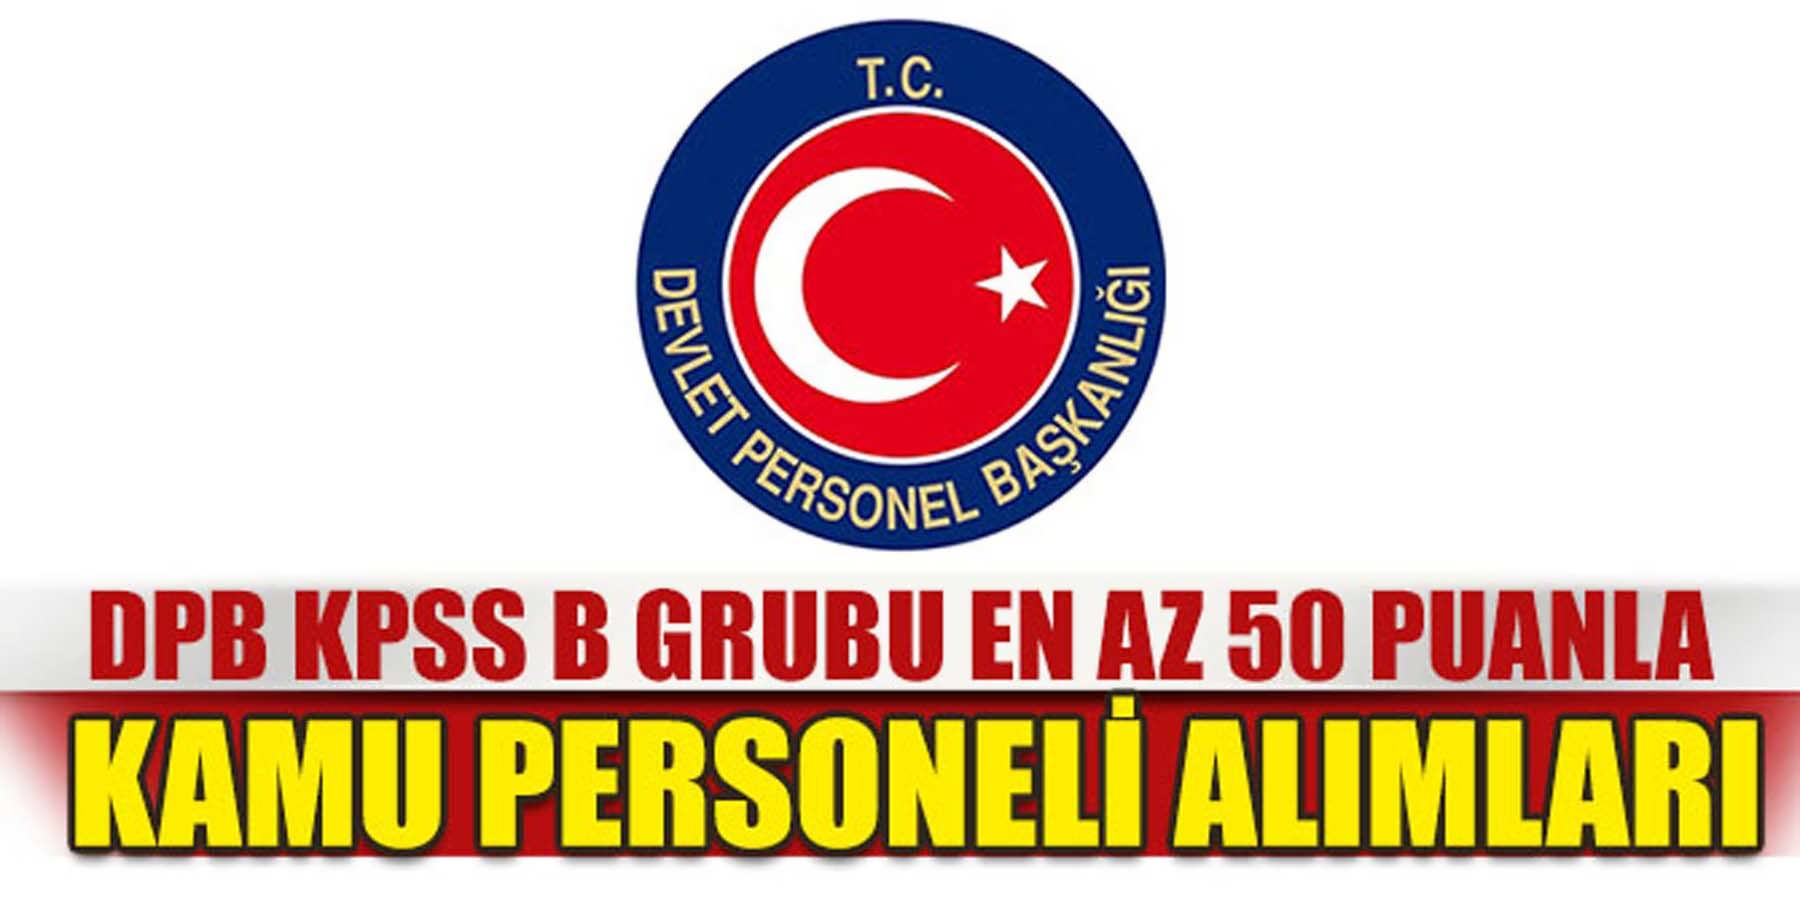 DPB KPSS B Grubu 50 Puan ile Kamu Personeli Alımı Yayınladı